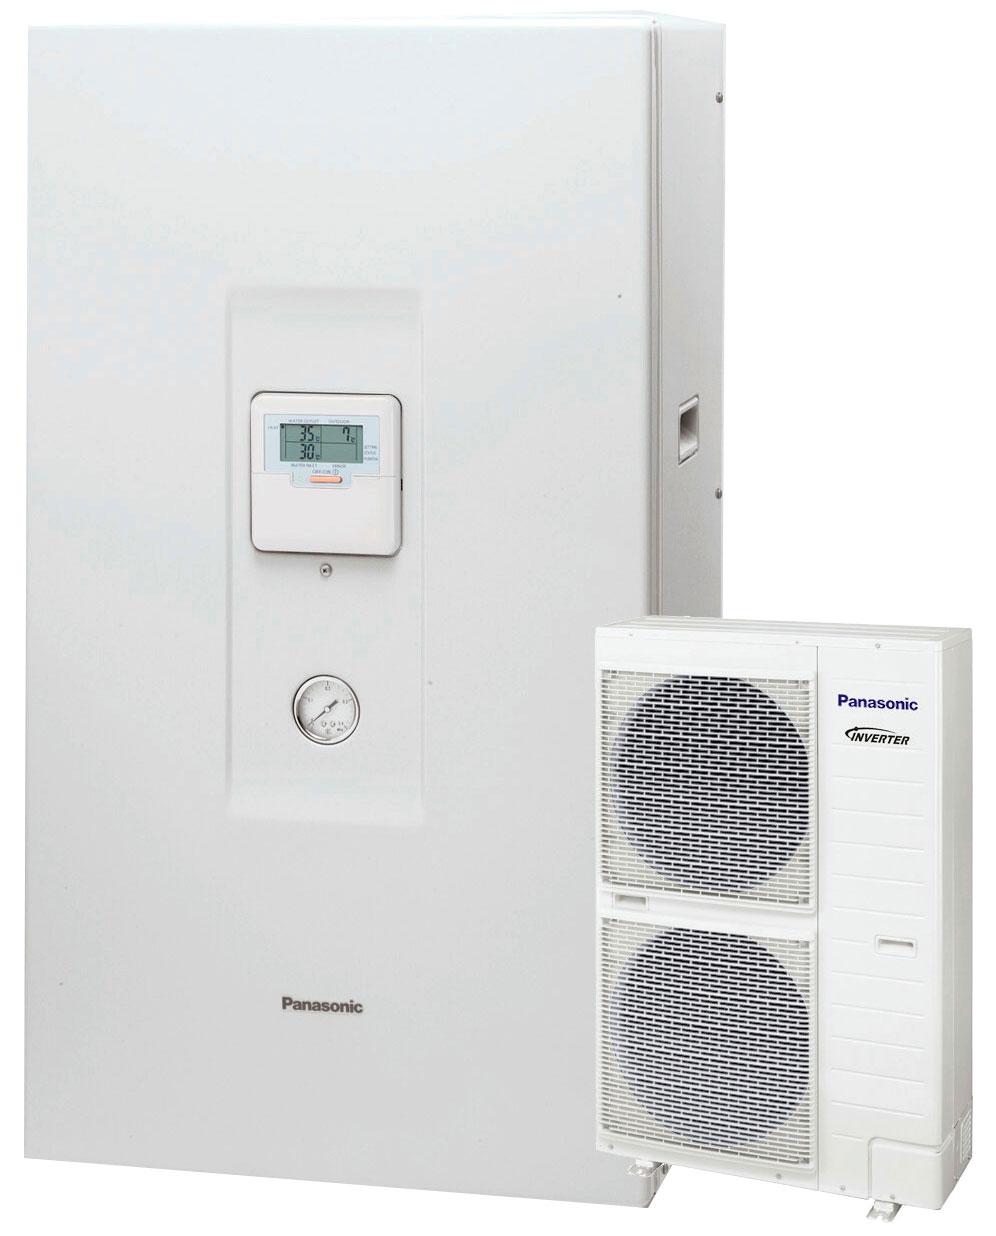 Panasonic Aquarea 9 kW